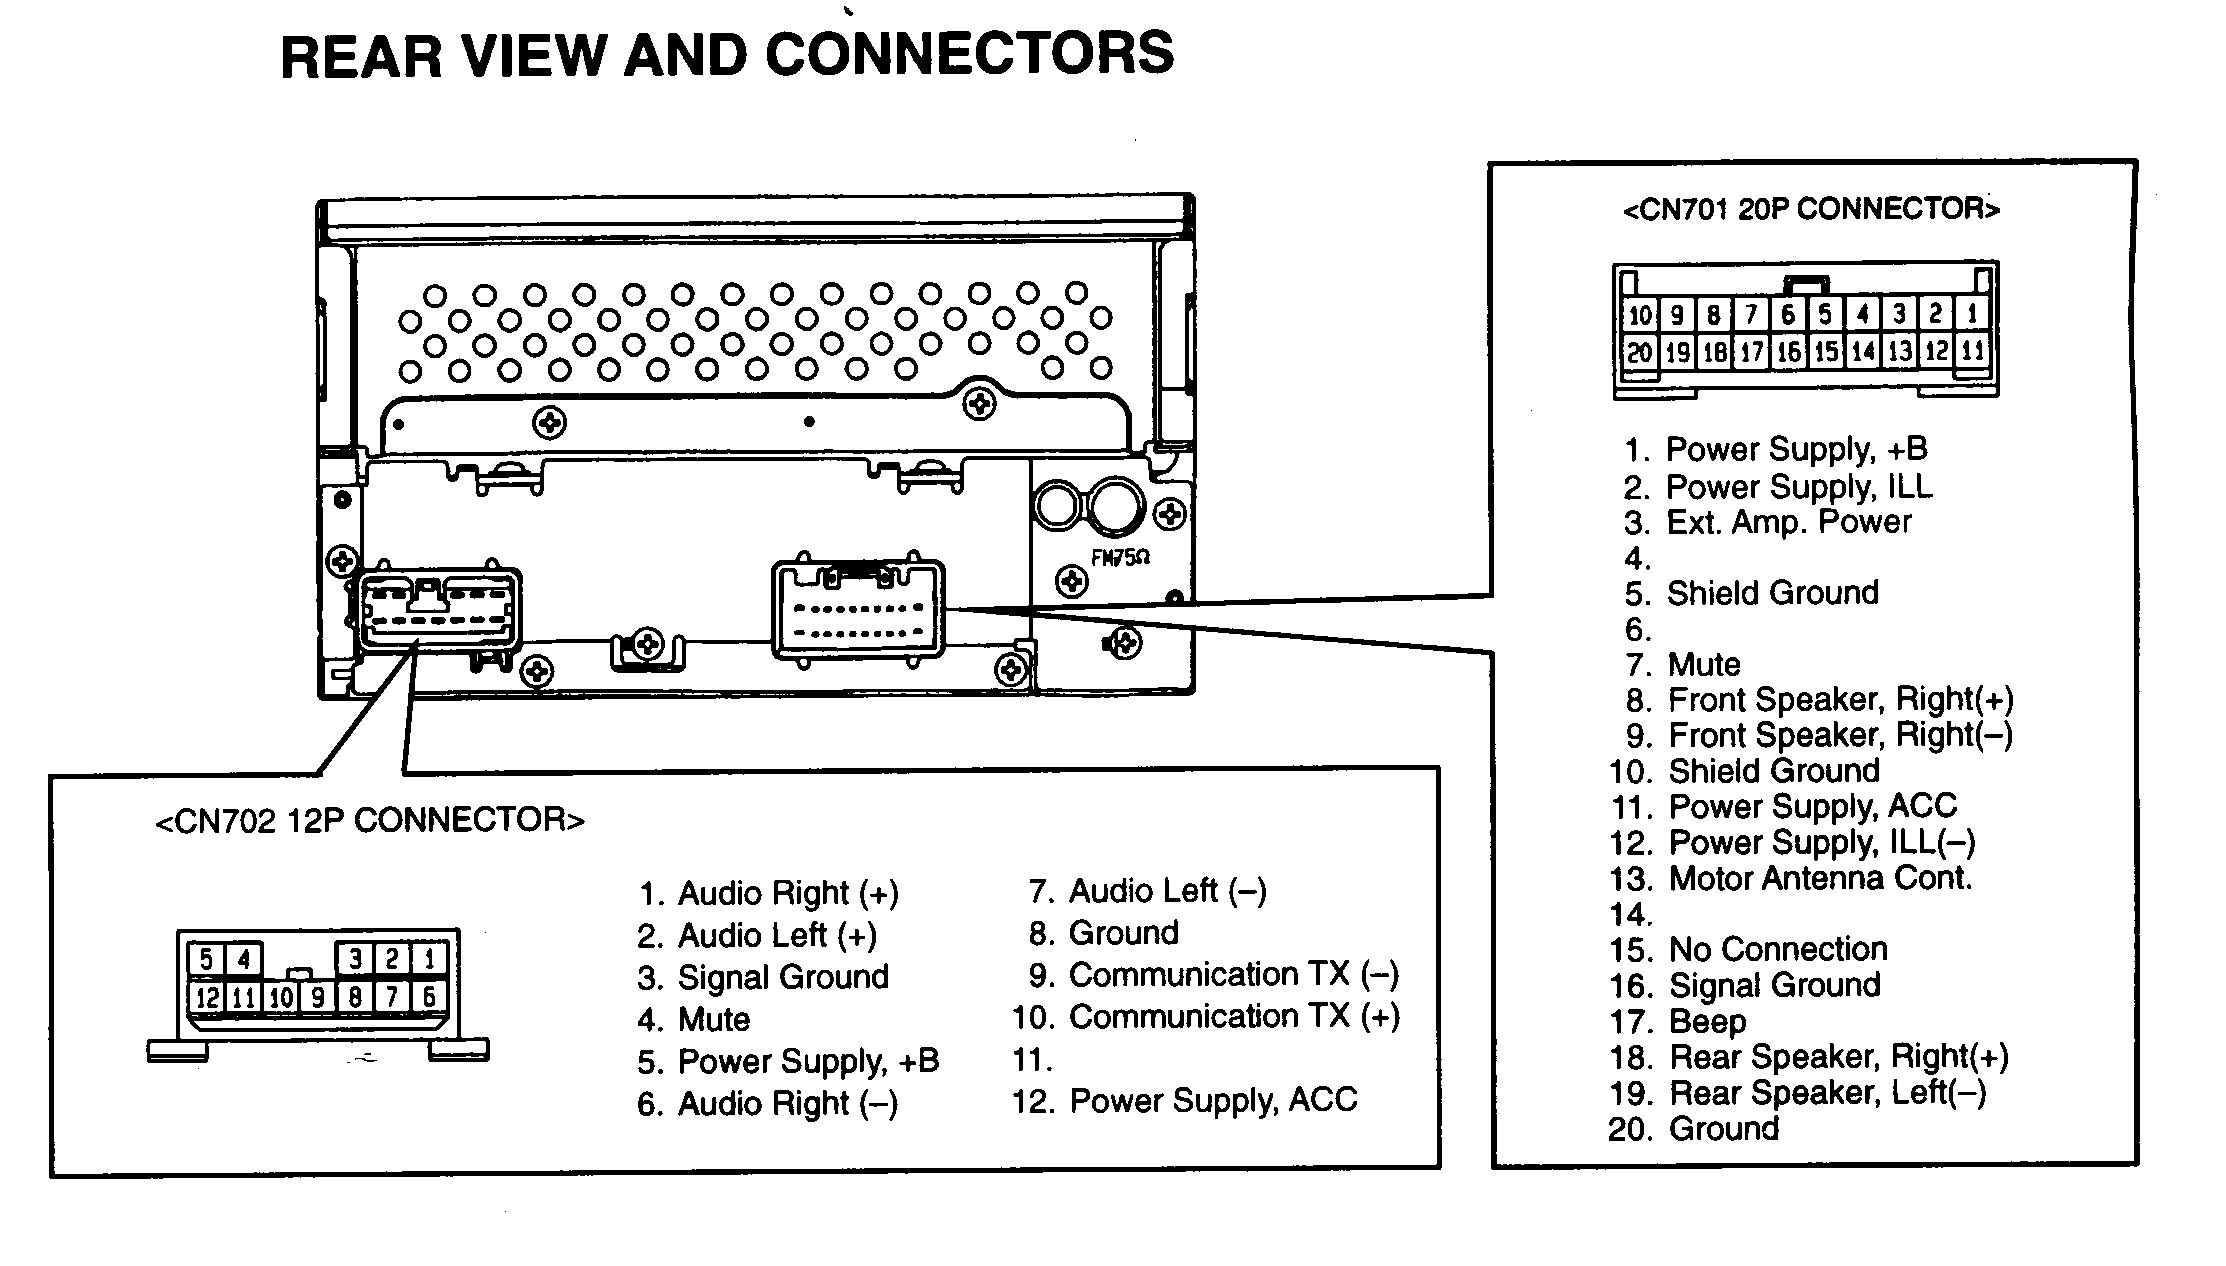 Bose car stereo wiring diagram car stereo wiring diagram bmw car bose car stereo wiring diagram with factory car stereo wiring diagrams wiring diagram of bose car swarovskicordoba Gallery